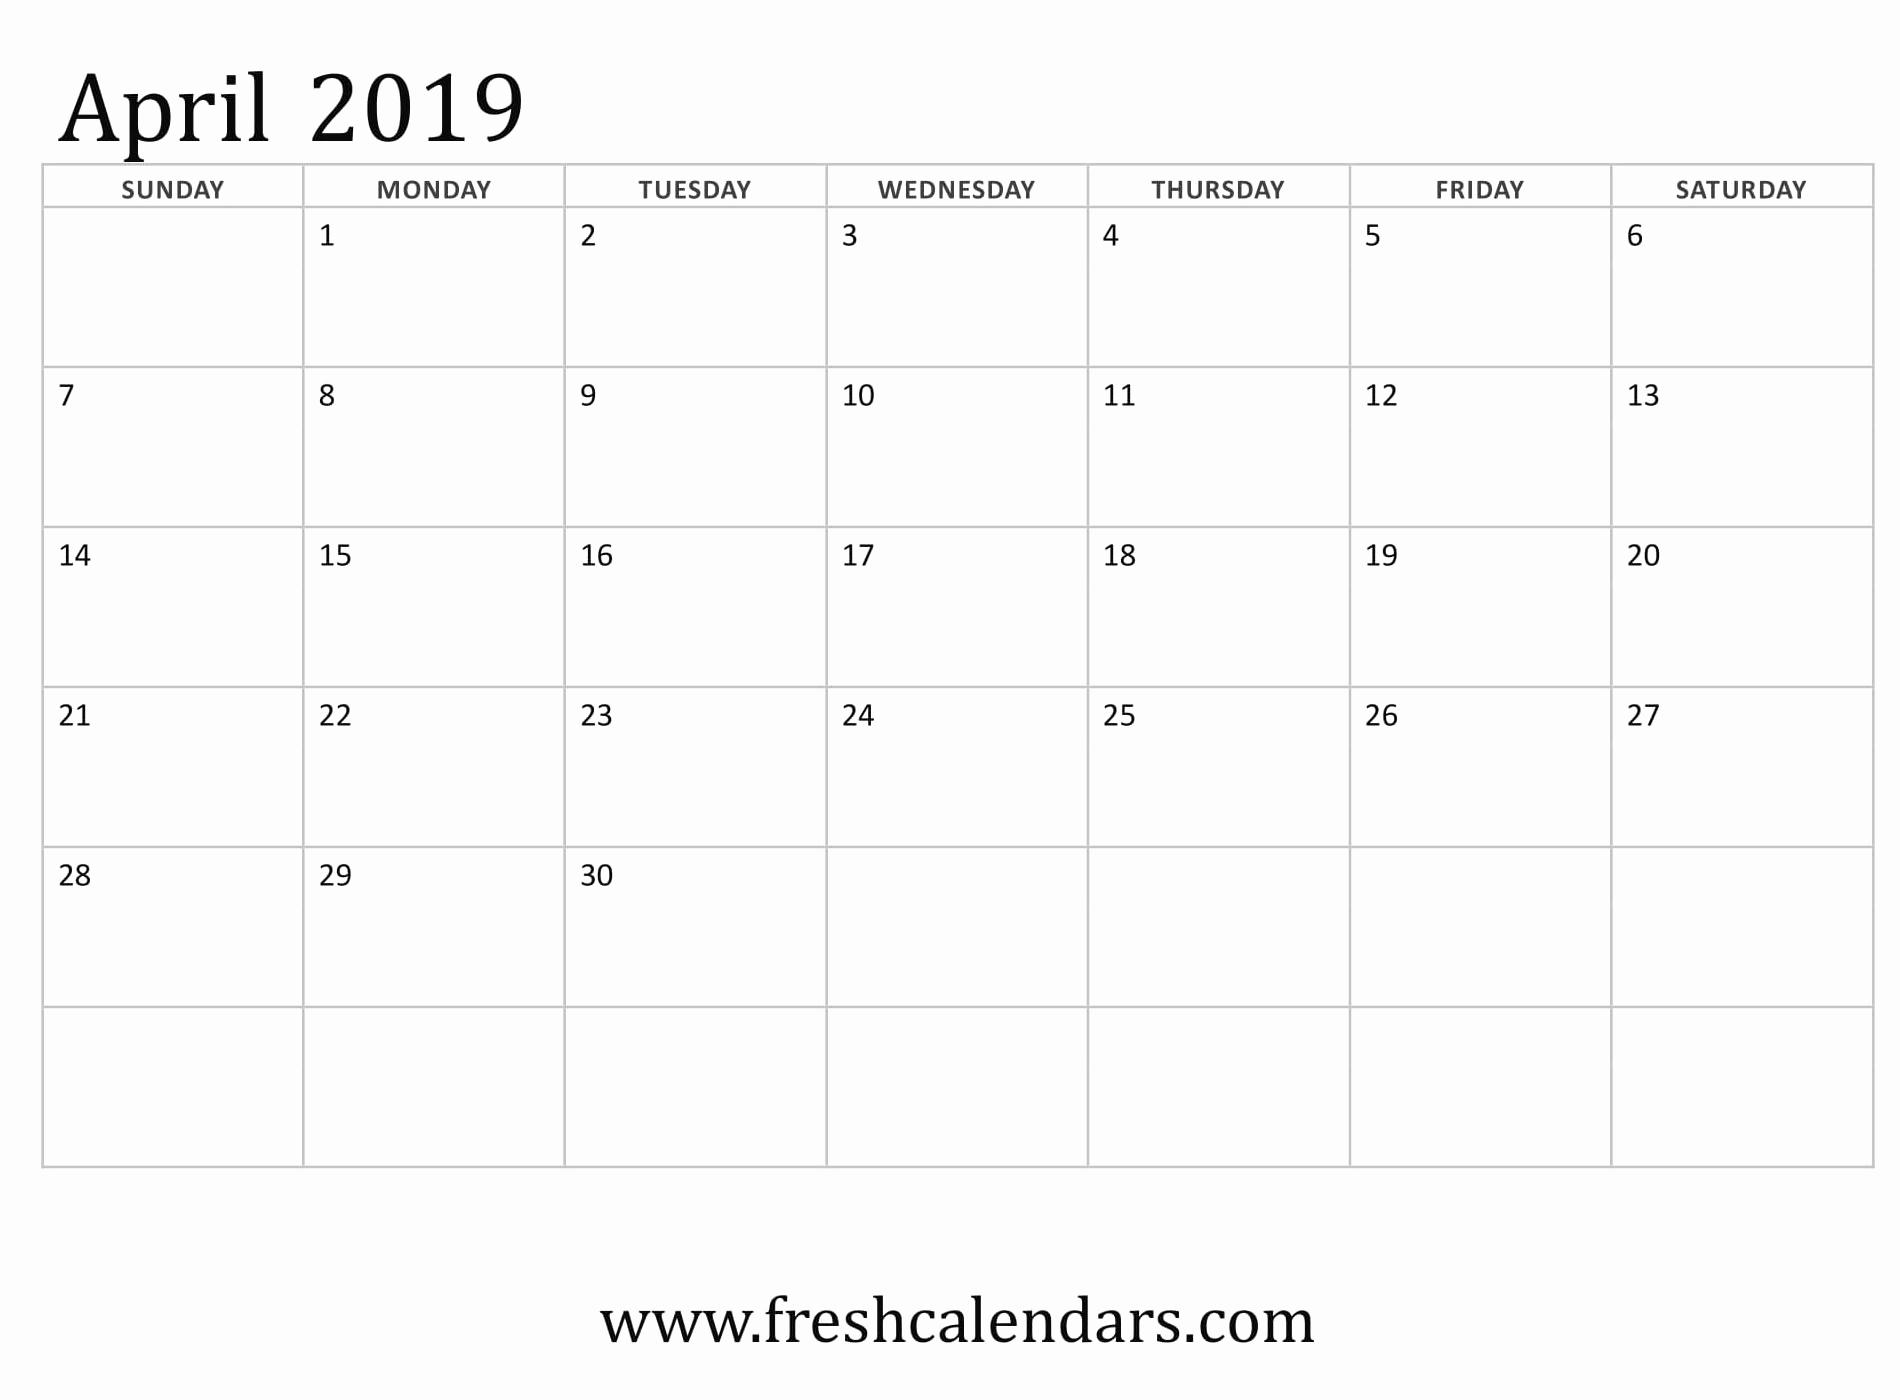 Monthly Calendar Template 2019 Awesome April 2019 Calendar Printable Fresh Calendars